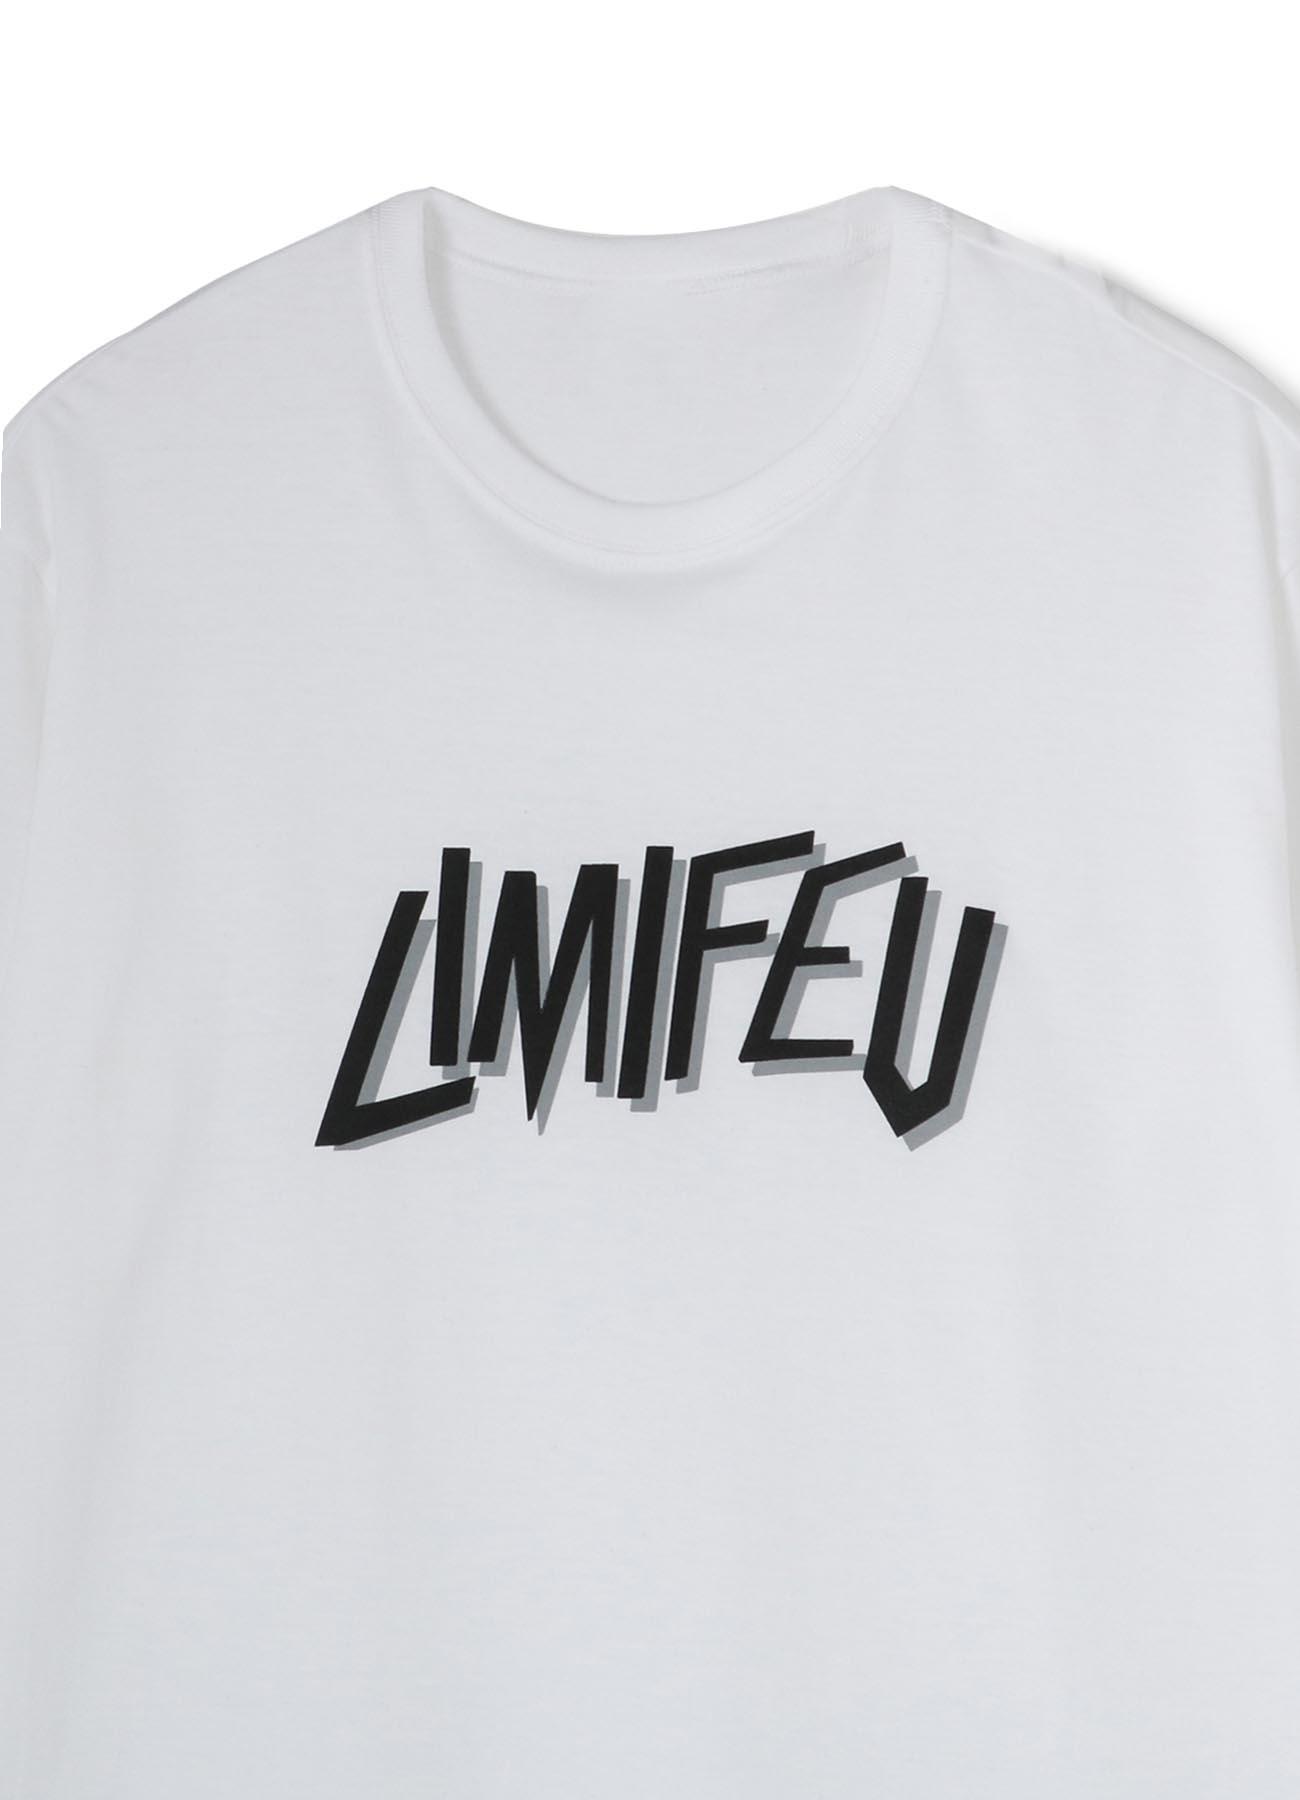 [THE SHOP Limited Product] 20/-Plain Stitch LIMI FEU Print T-Shirt E